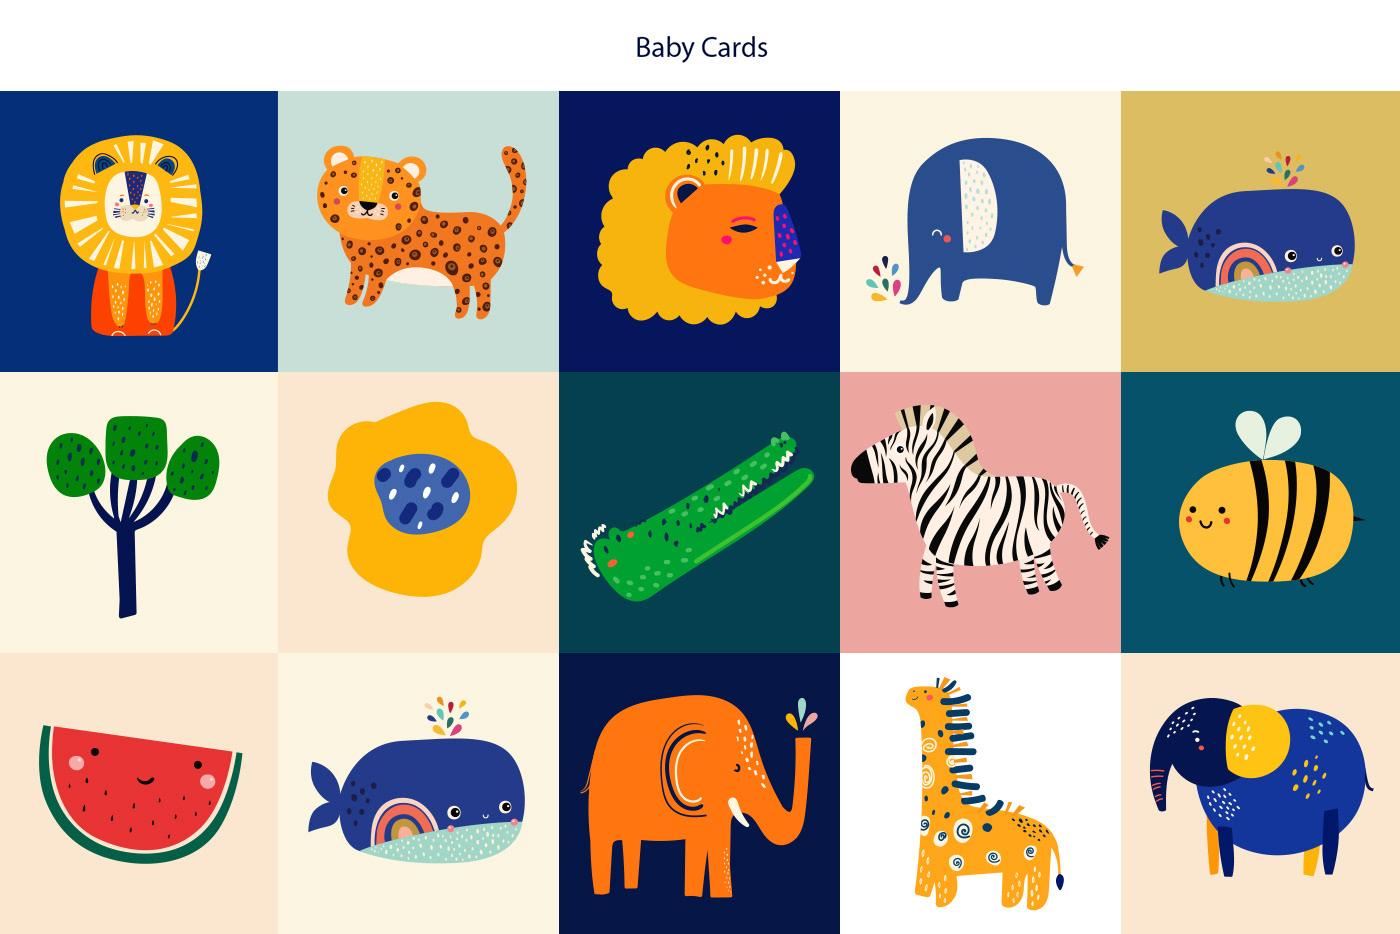 animals baby pattern  Cartoon Illustration childish pattern fabric pattern kids apparel kids design kids pattern seamless pattern surface design